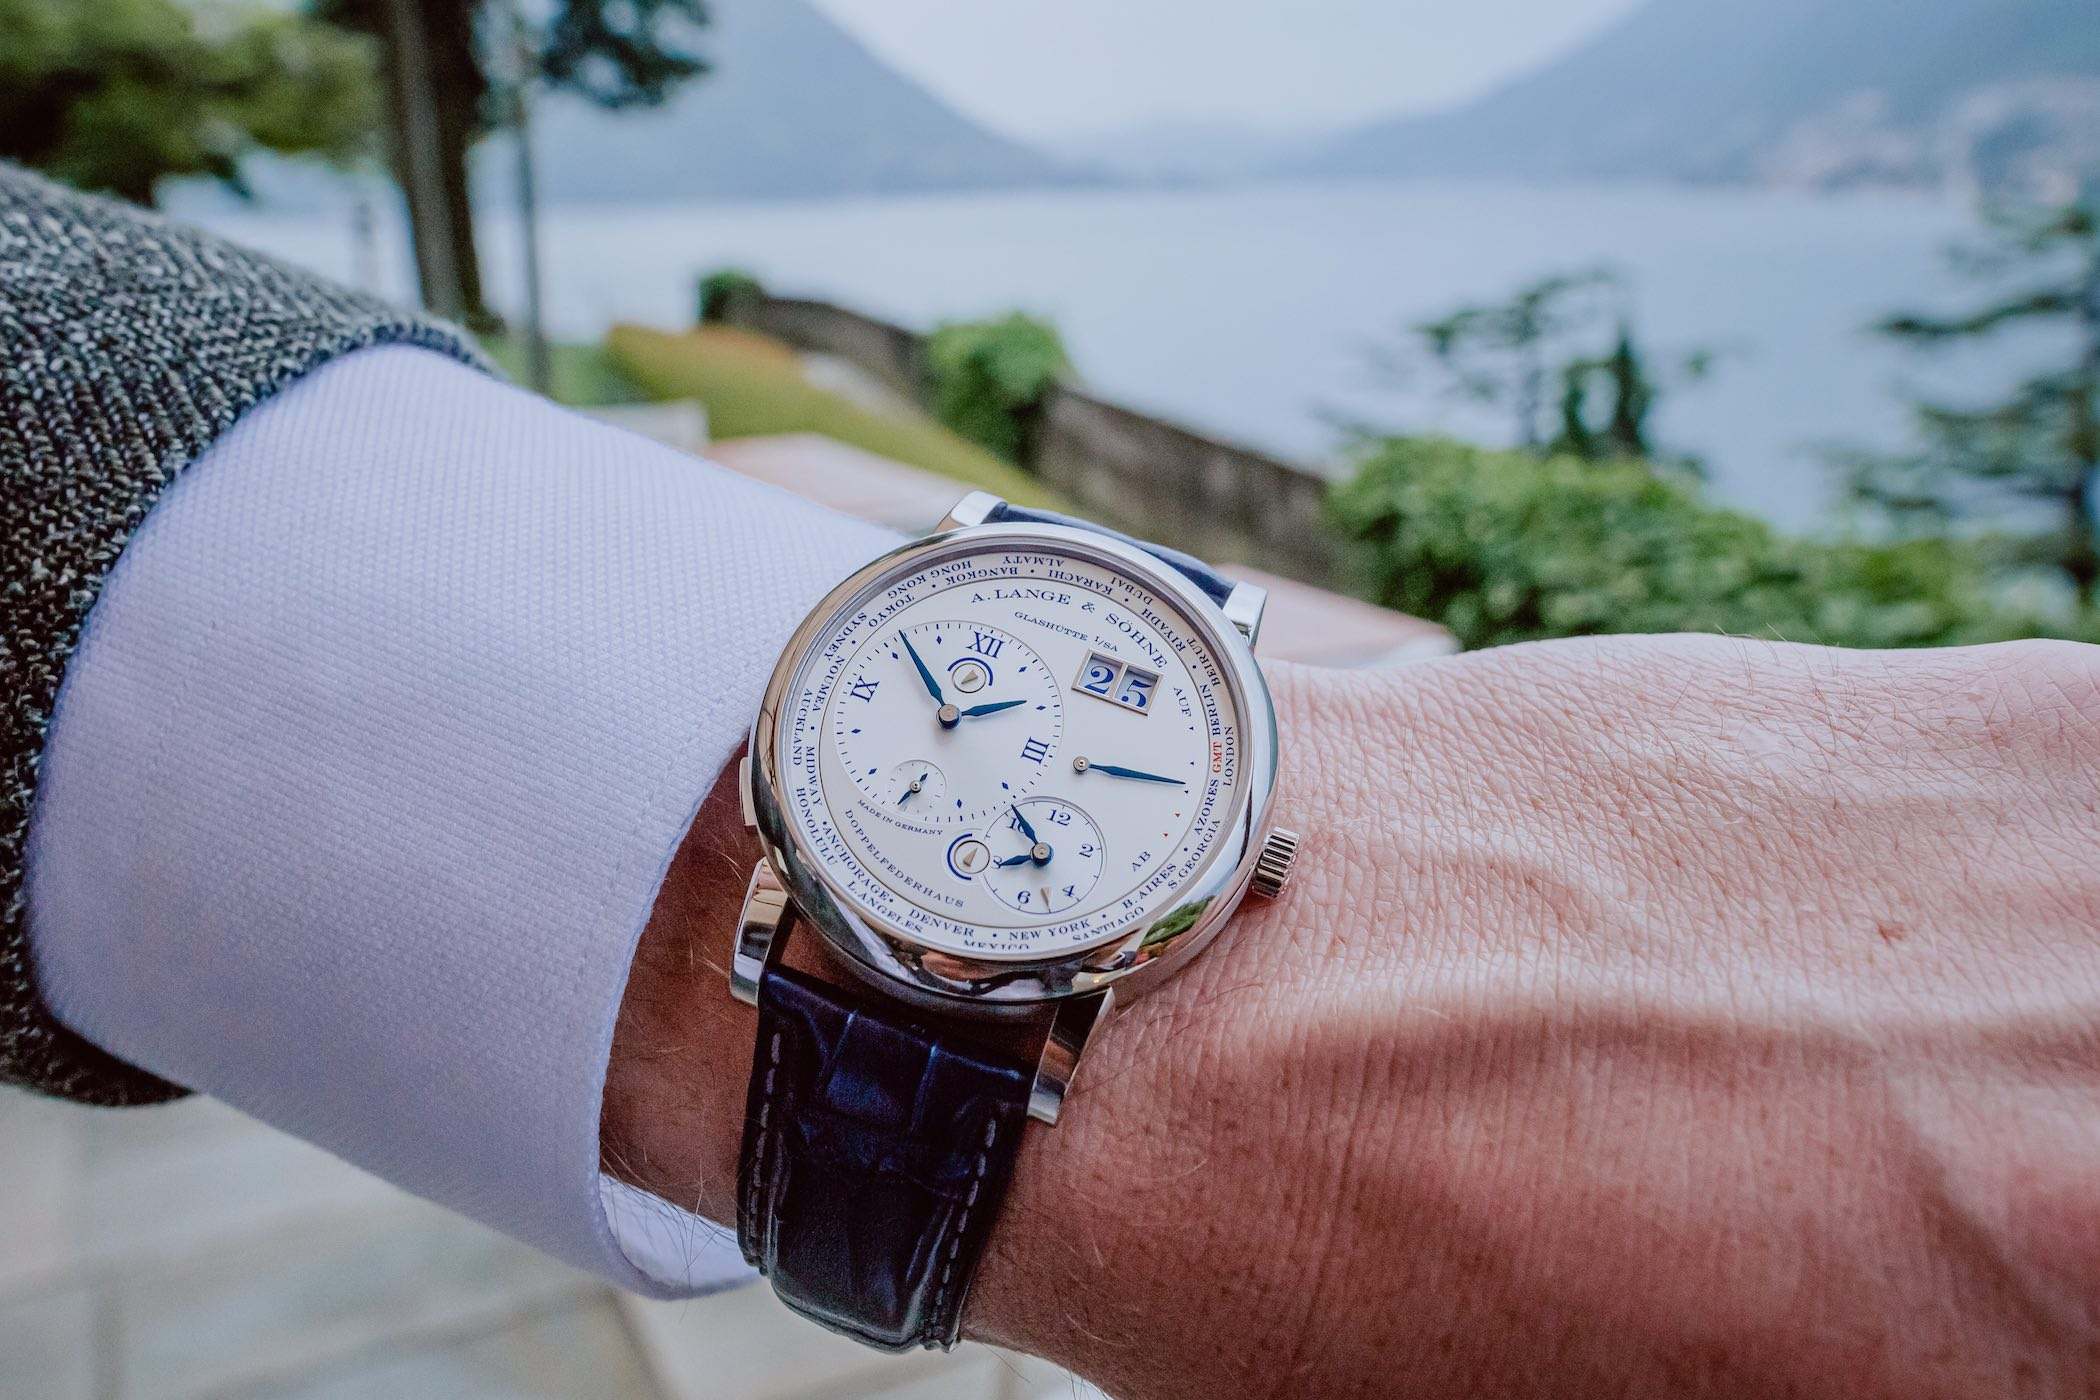 Concorso d'Eleganza Villa d'Este 2019 Lange Sohne Lange 1 Time Zone 25th Anniversary